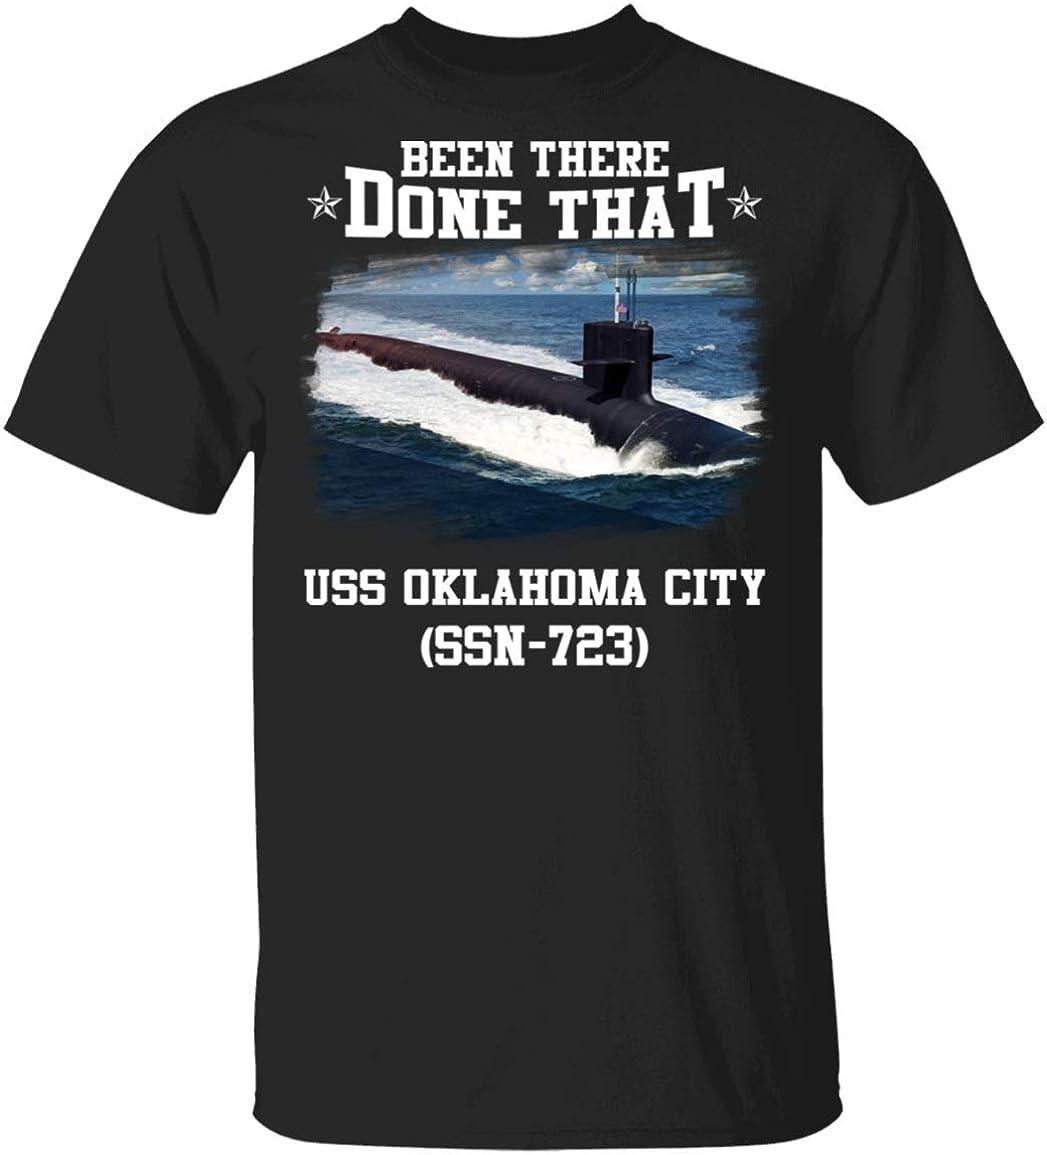 Charles Pricess USS Oklahoma City SSN-723 Veterans Day Christmas Tshirt